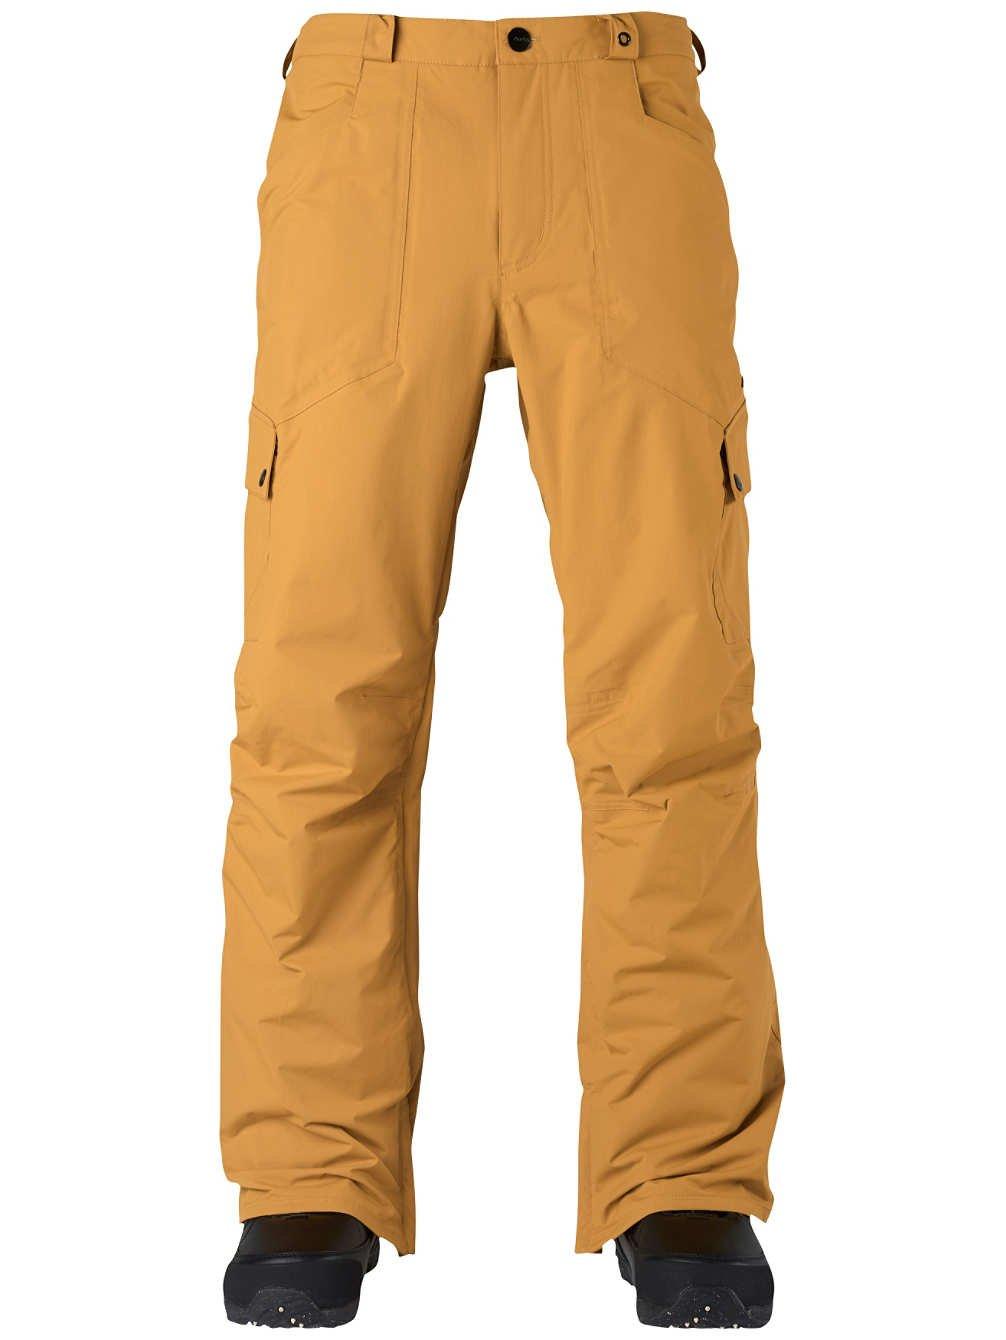 ANALOG Herren Snowboard Hose AG Anthem Pants